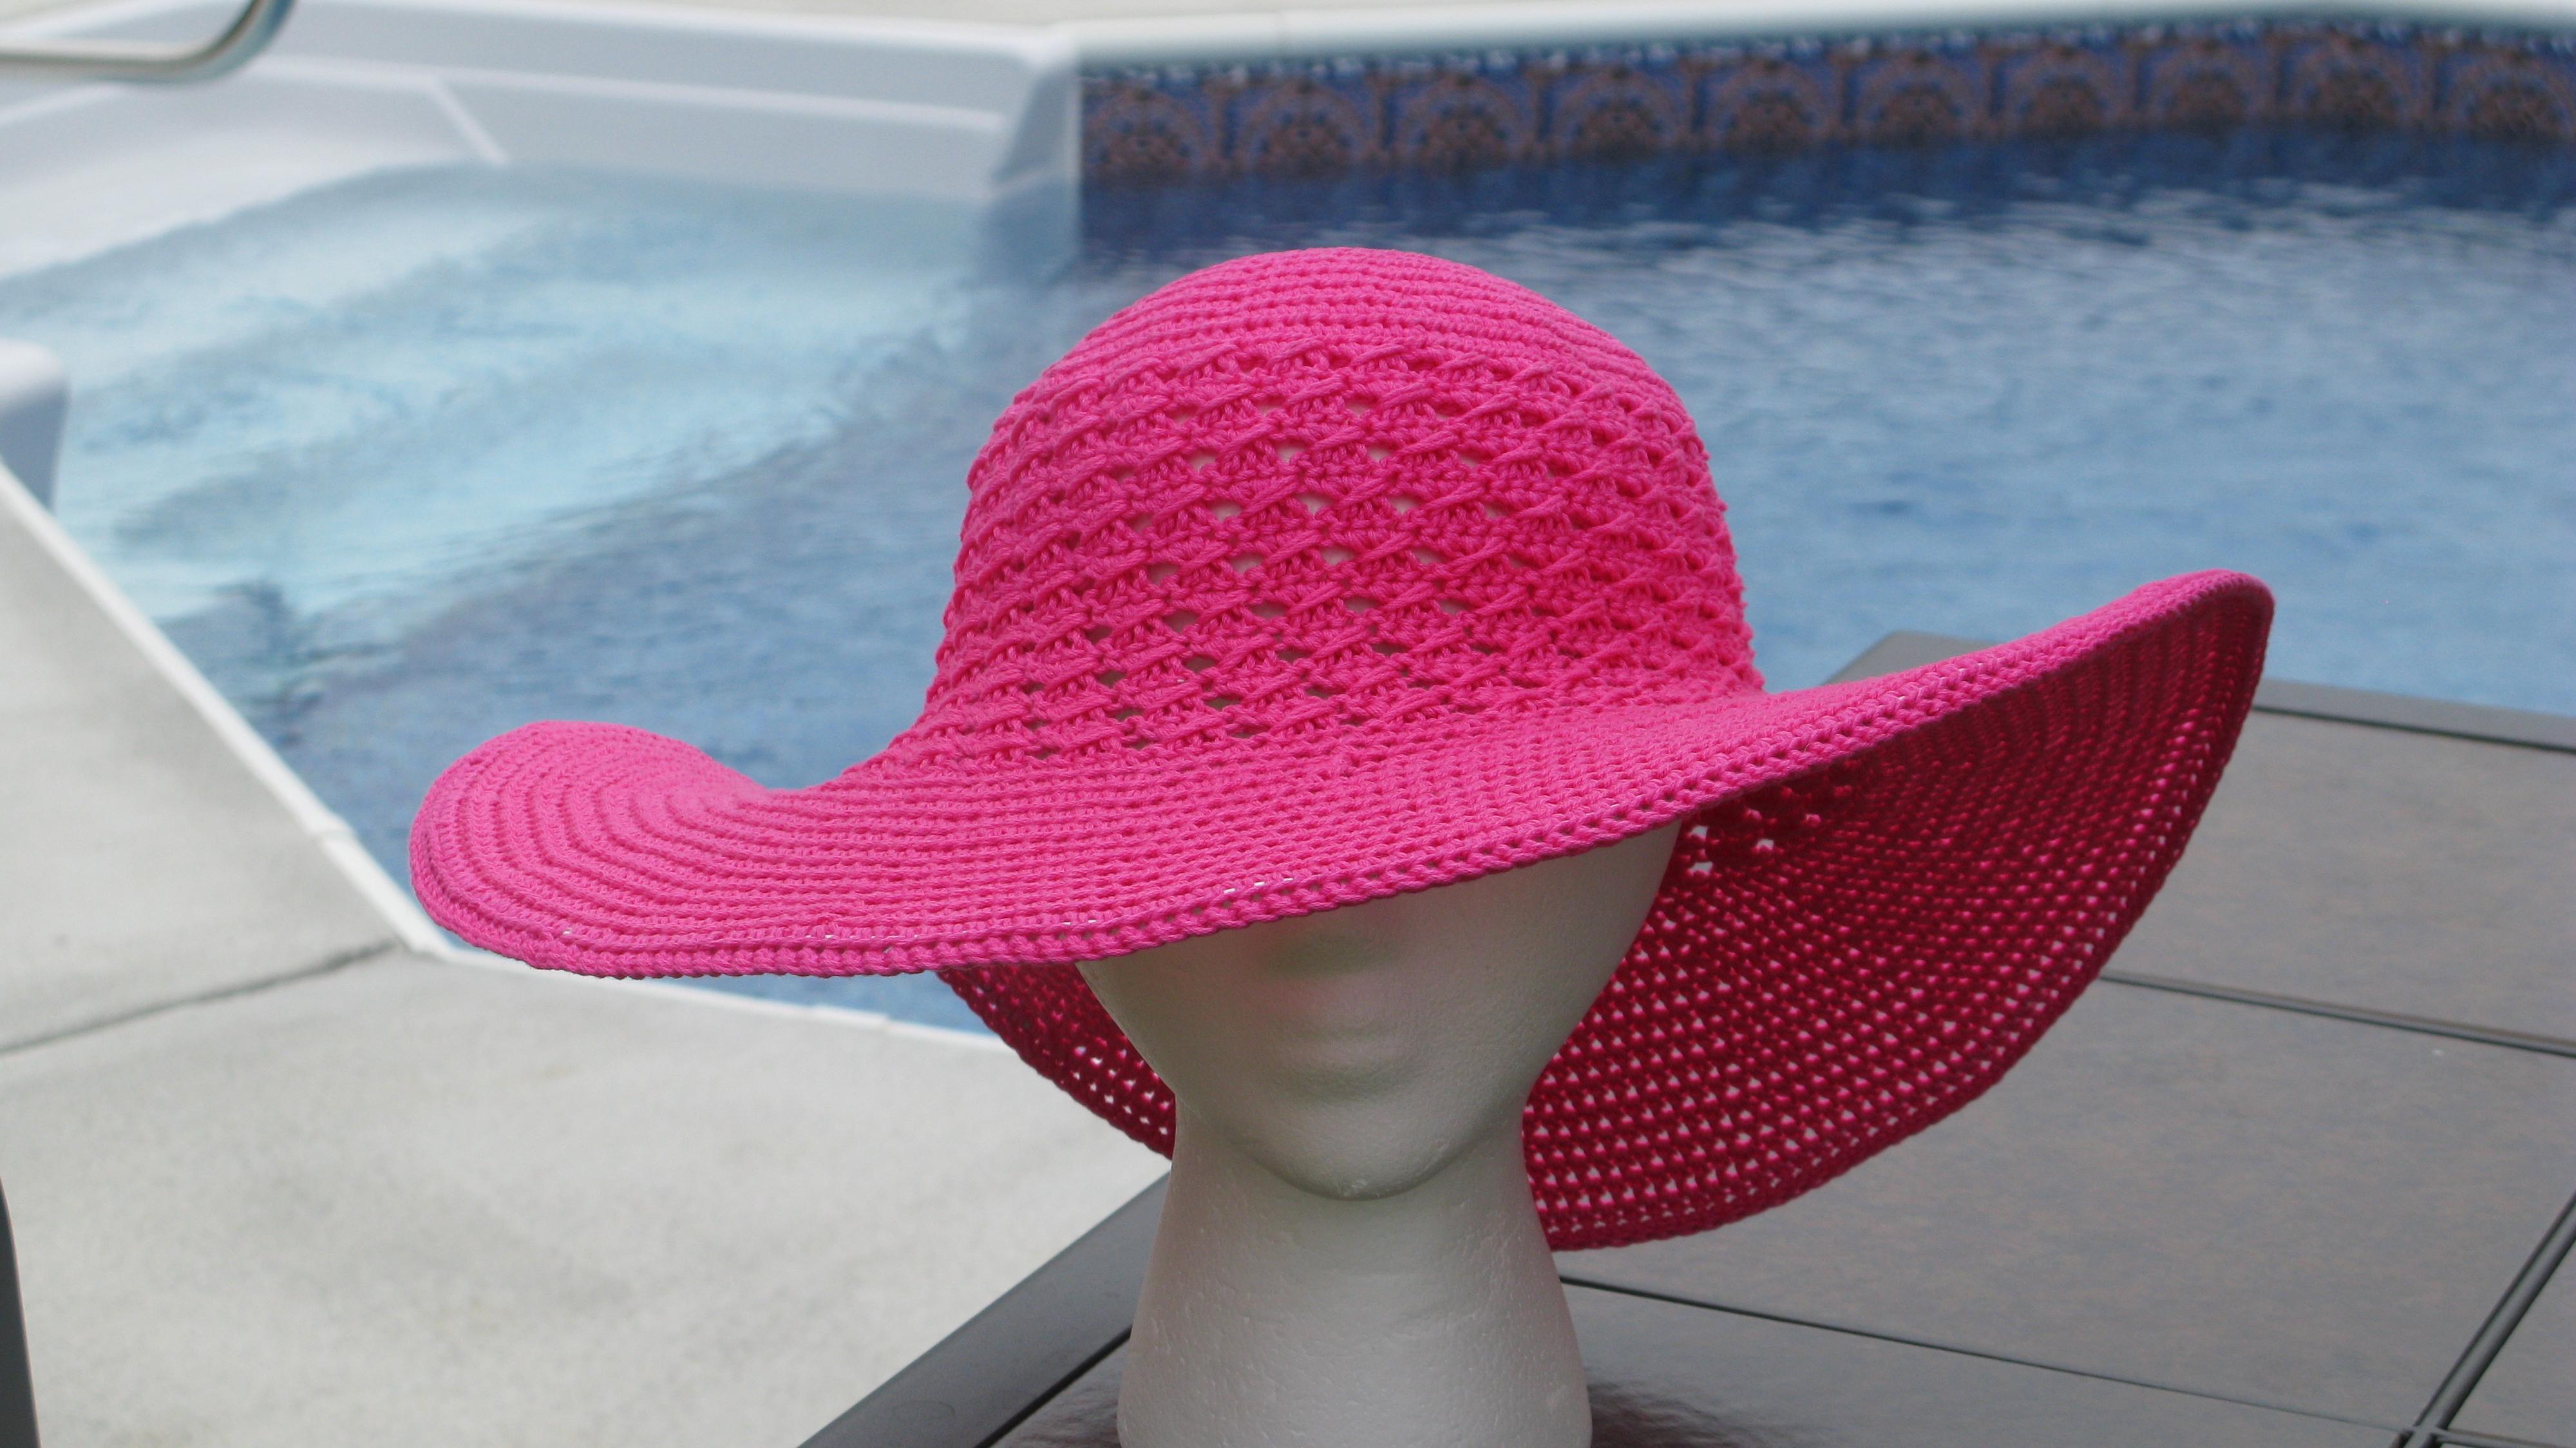 kathy sinfonia Summer Beach Hats 008